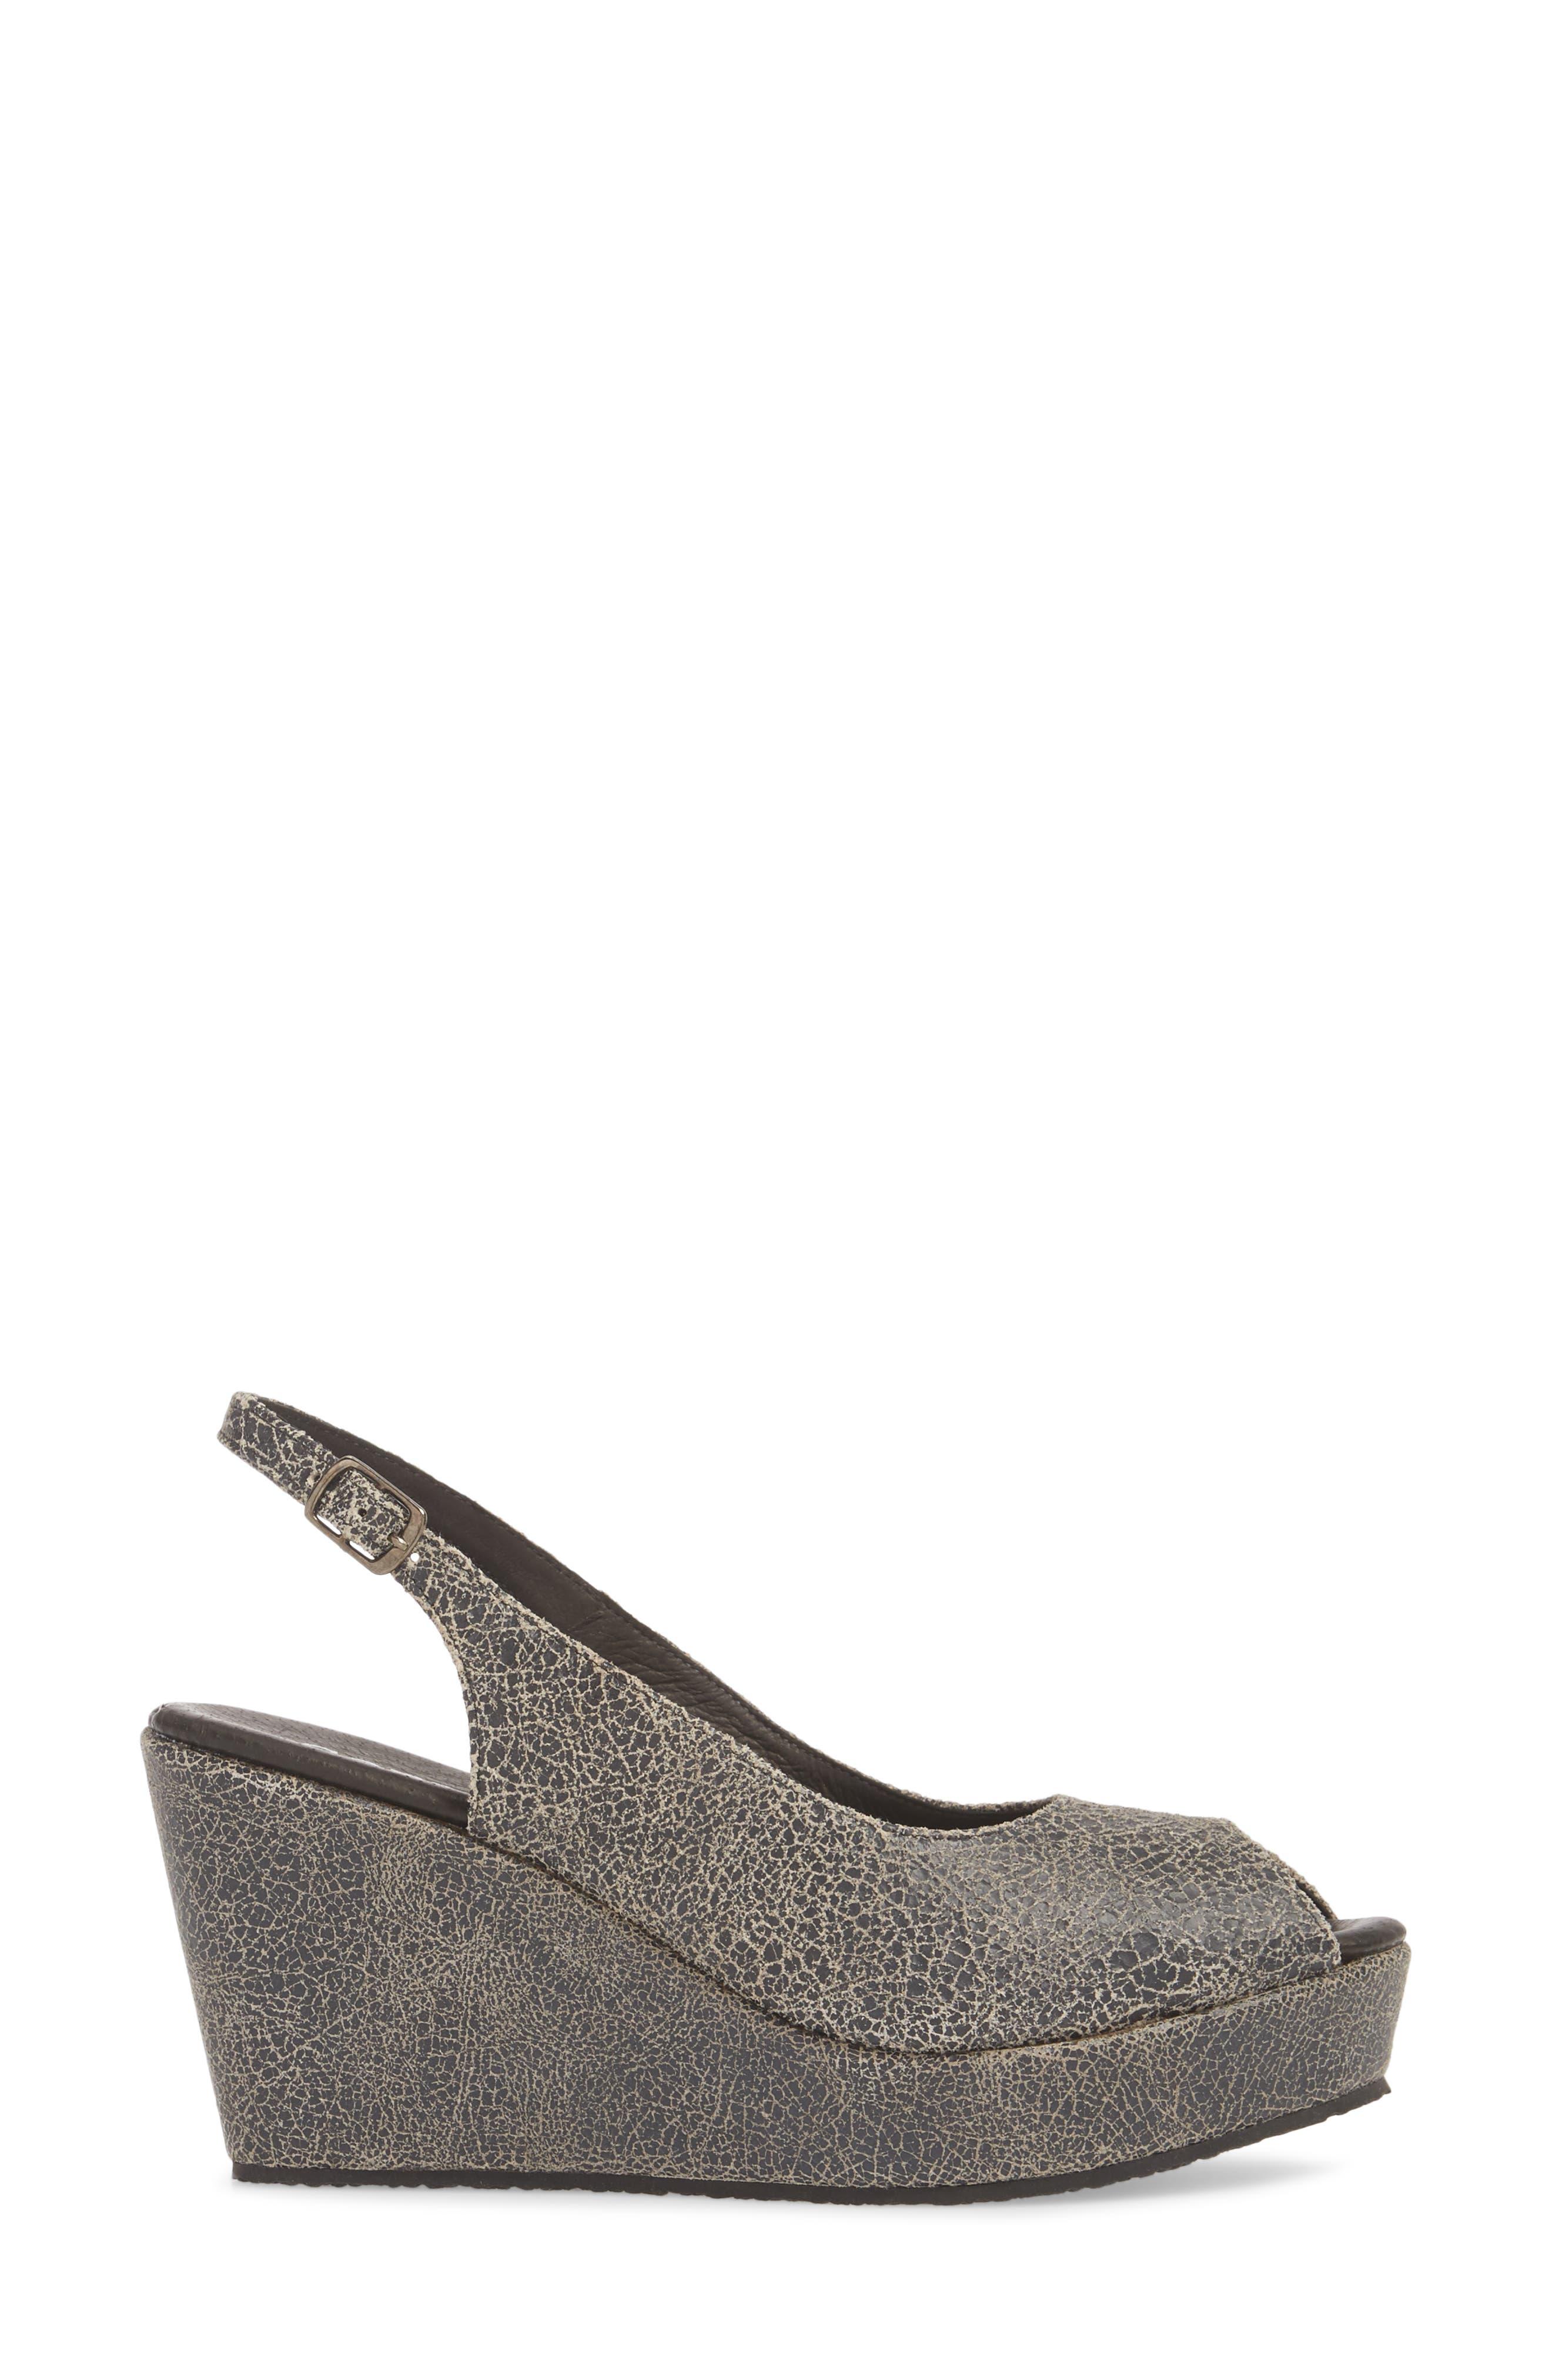 Fabrice Slingback Platform Sandal,                             Alternate thumbnail 3, color,                             Grey Crackle Leather